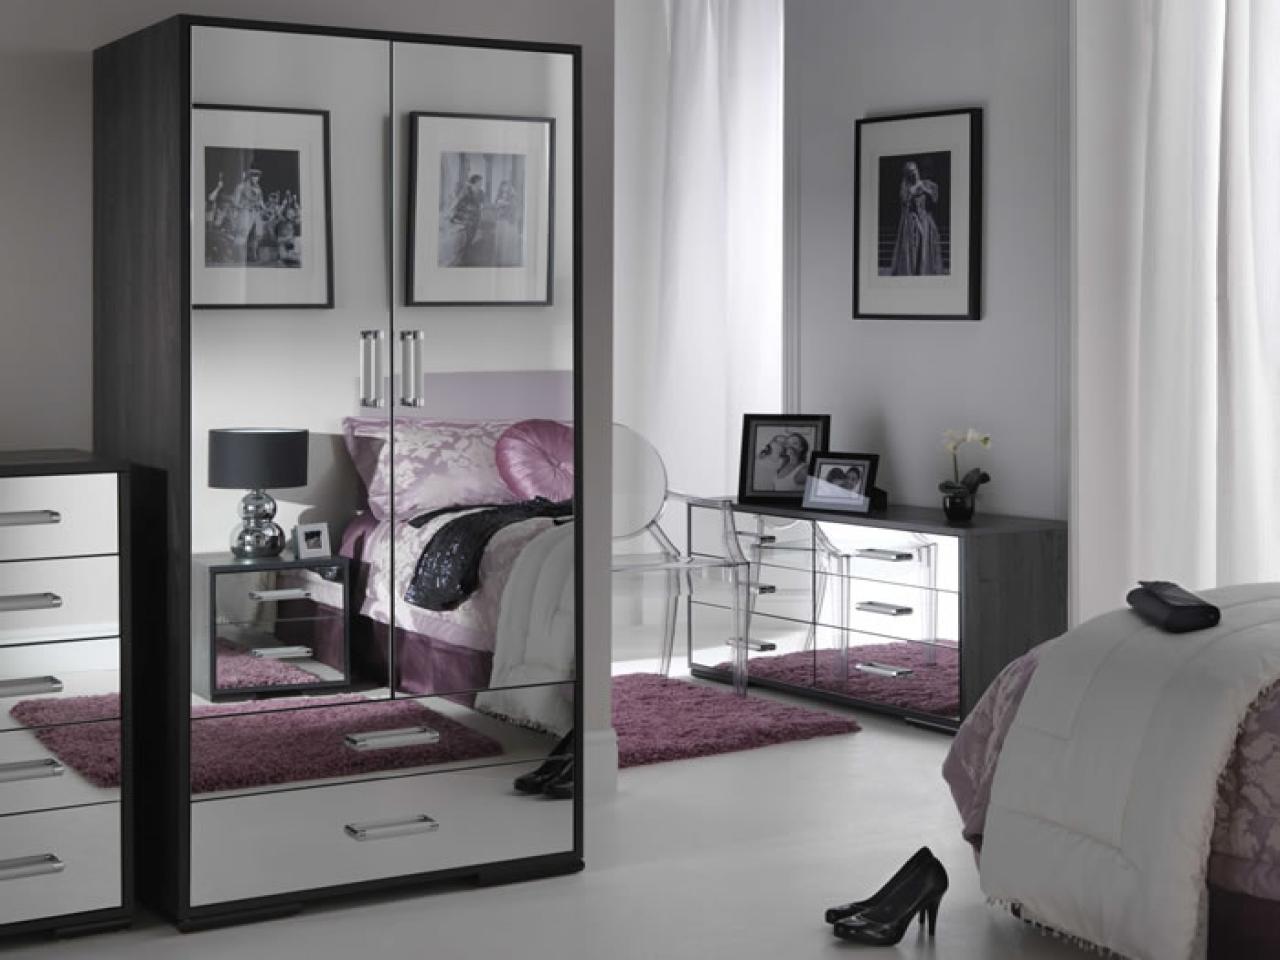 mirrored furniture bedroom set photo - 4